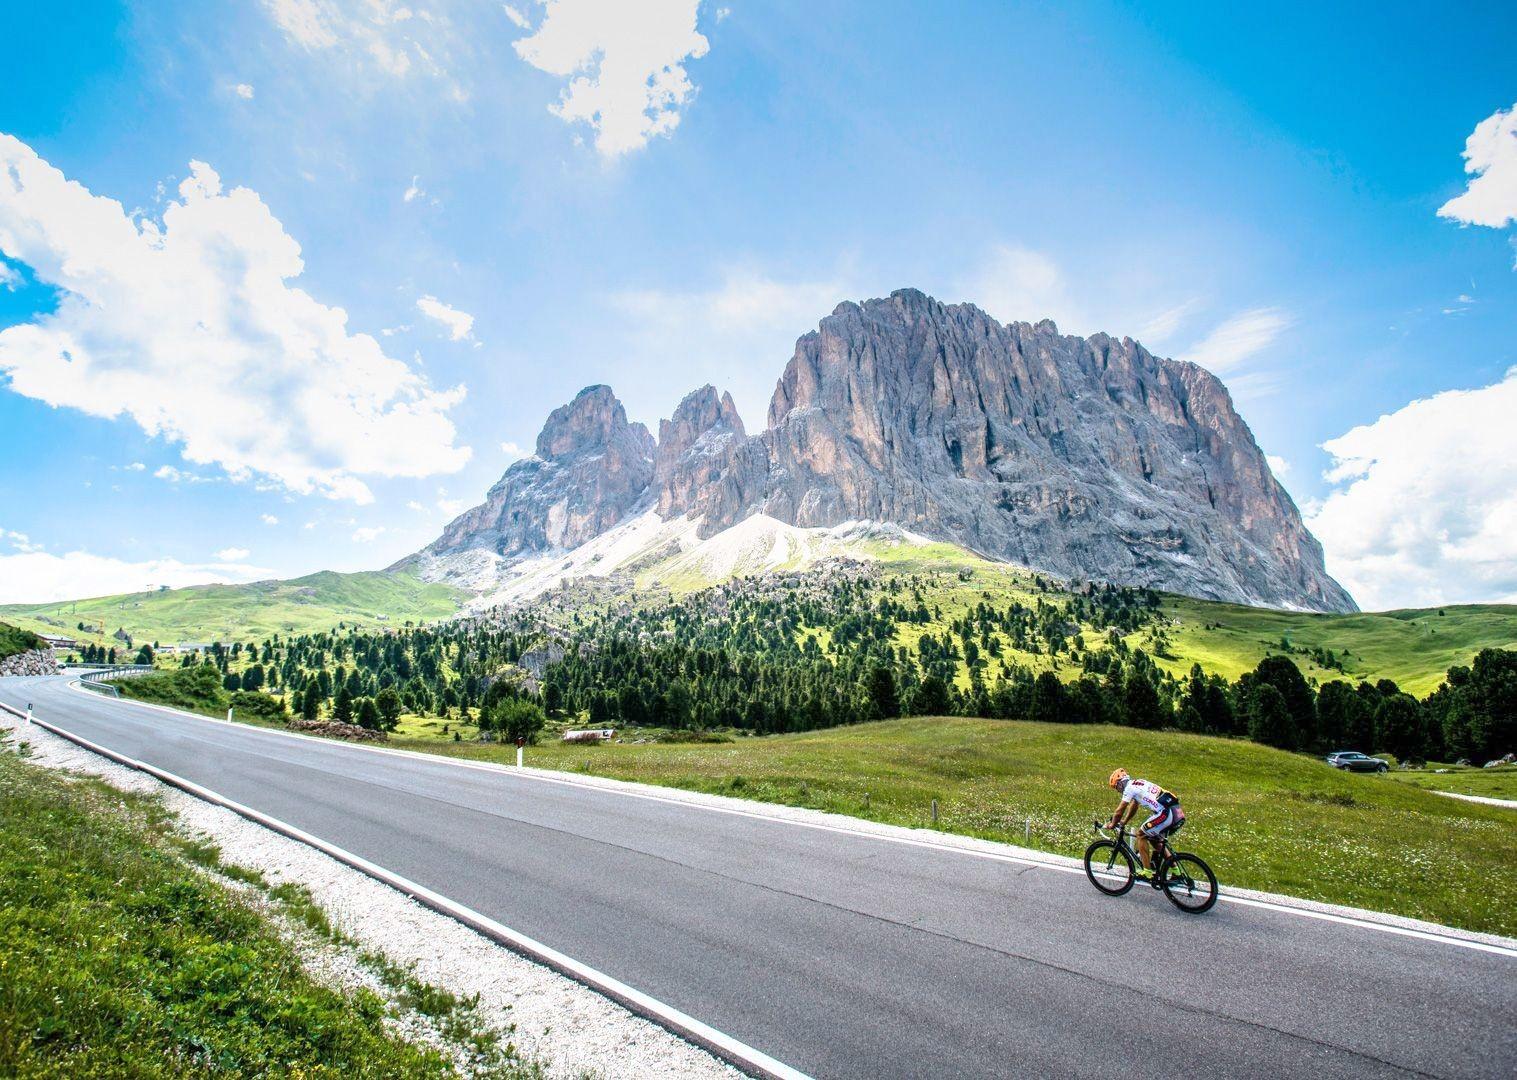 stunning-switzerland-italy-mountain-scenery-cycling-holiday-road.jpg - Italy - Raid Dolomiti - Guided Road Cycling Holiday - Italia Road Cycling